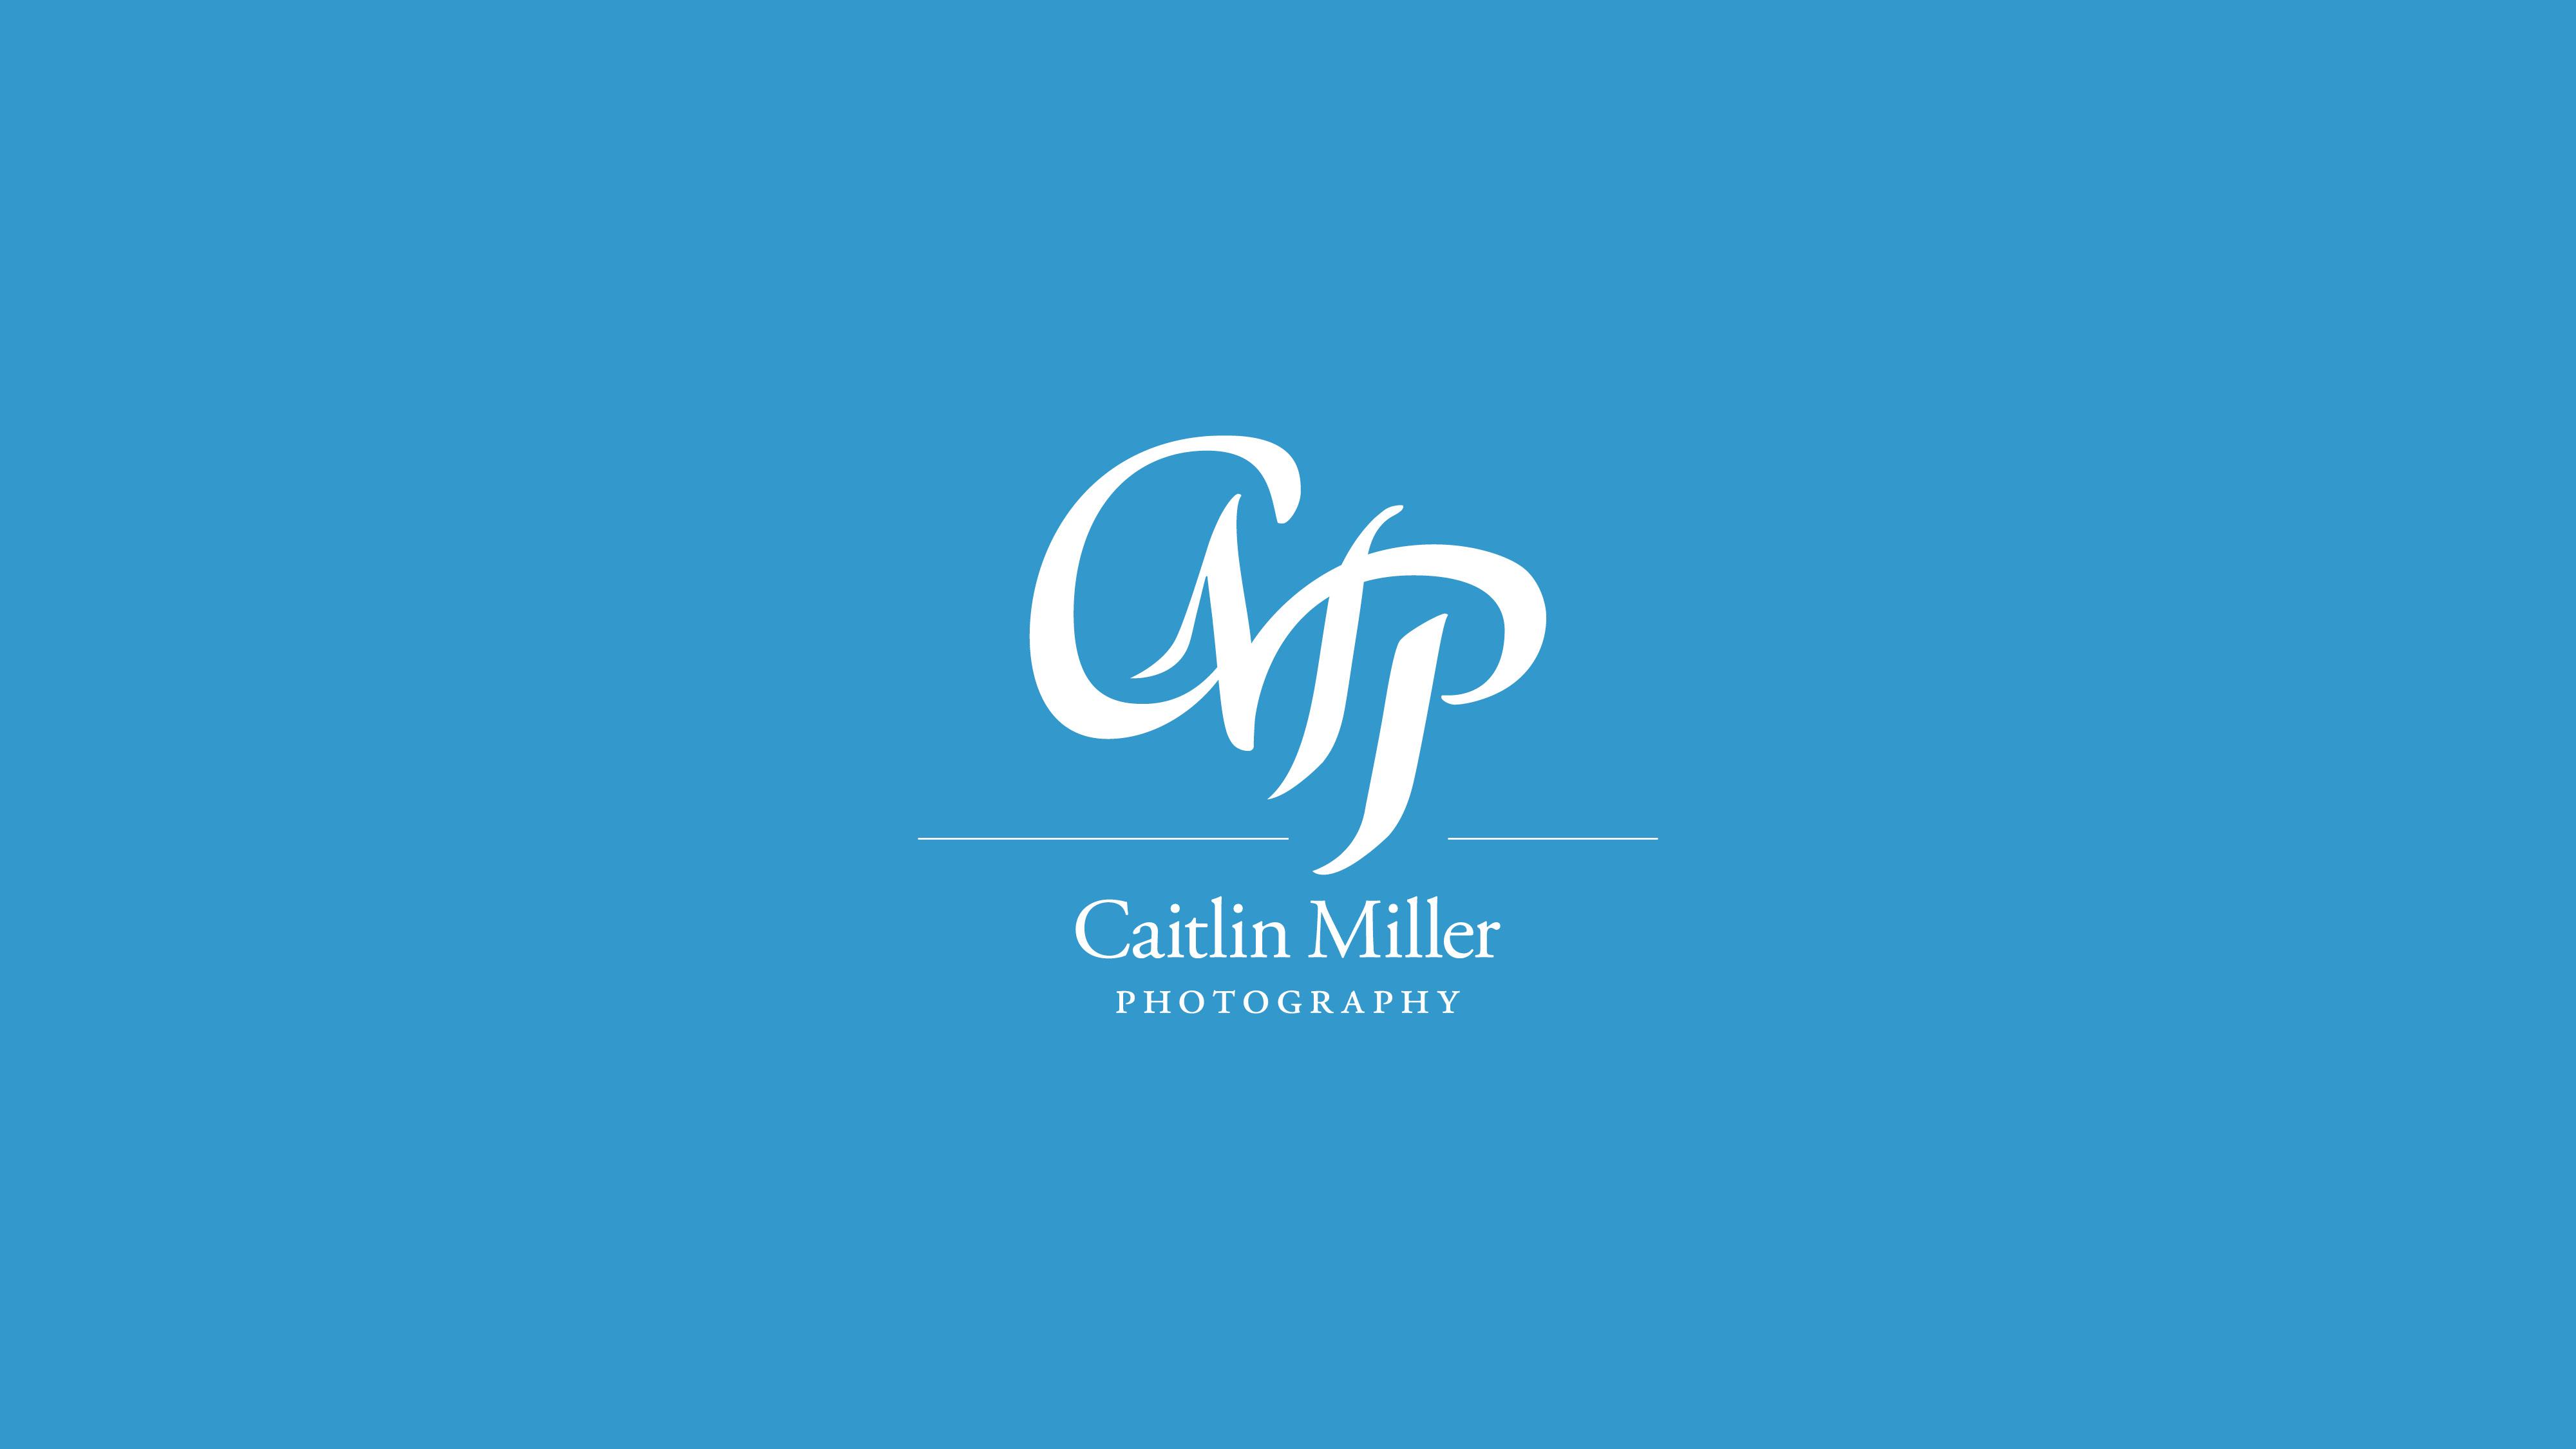 Jake Cooper Design - Logo - Caitlin Miller Photography Branding